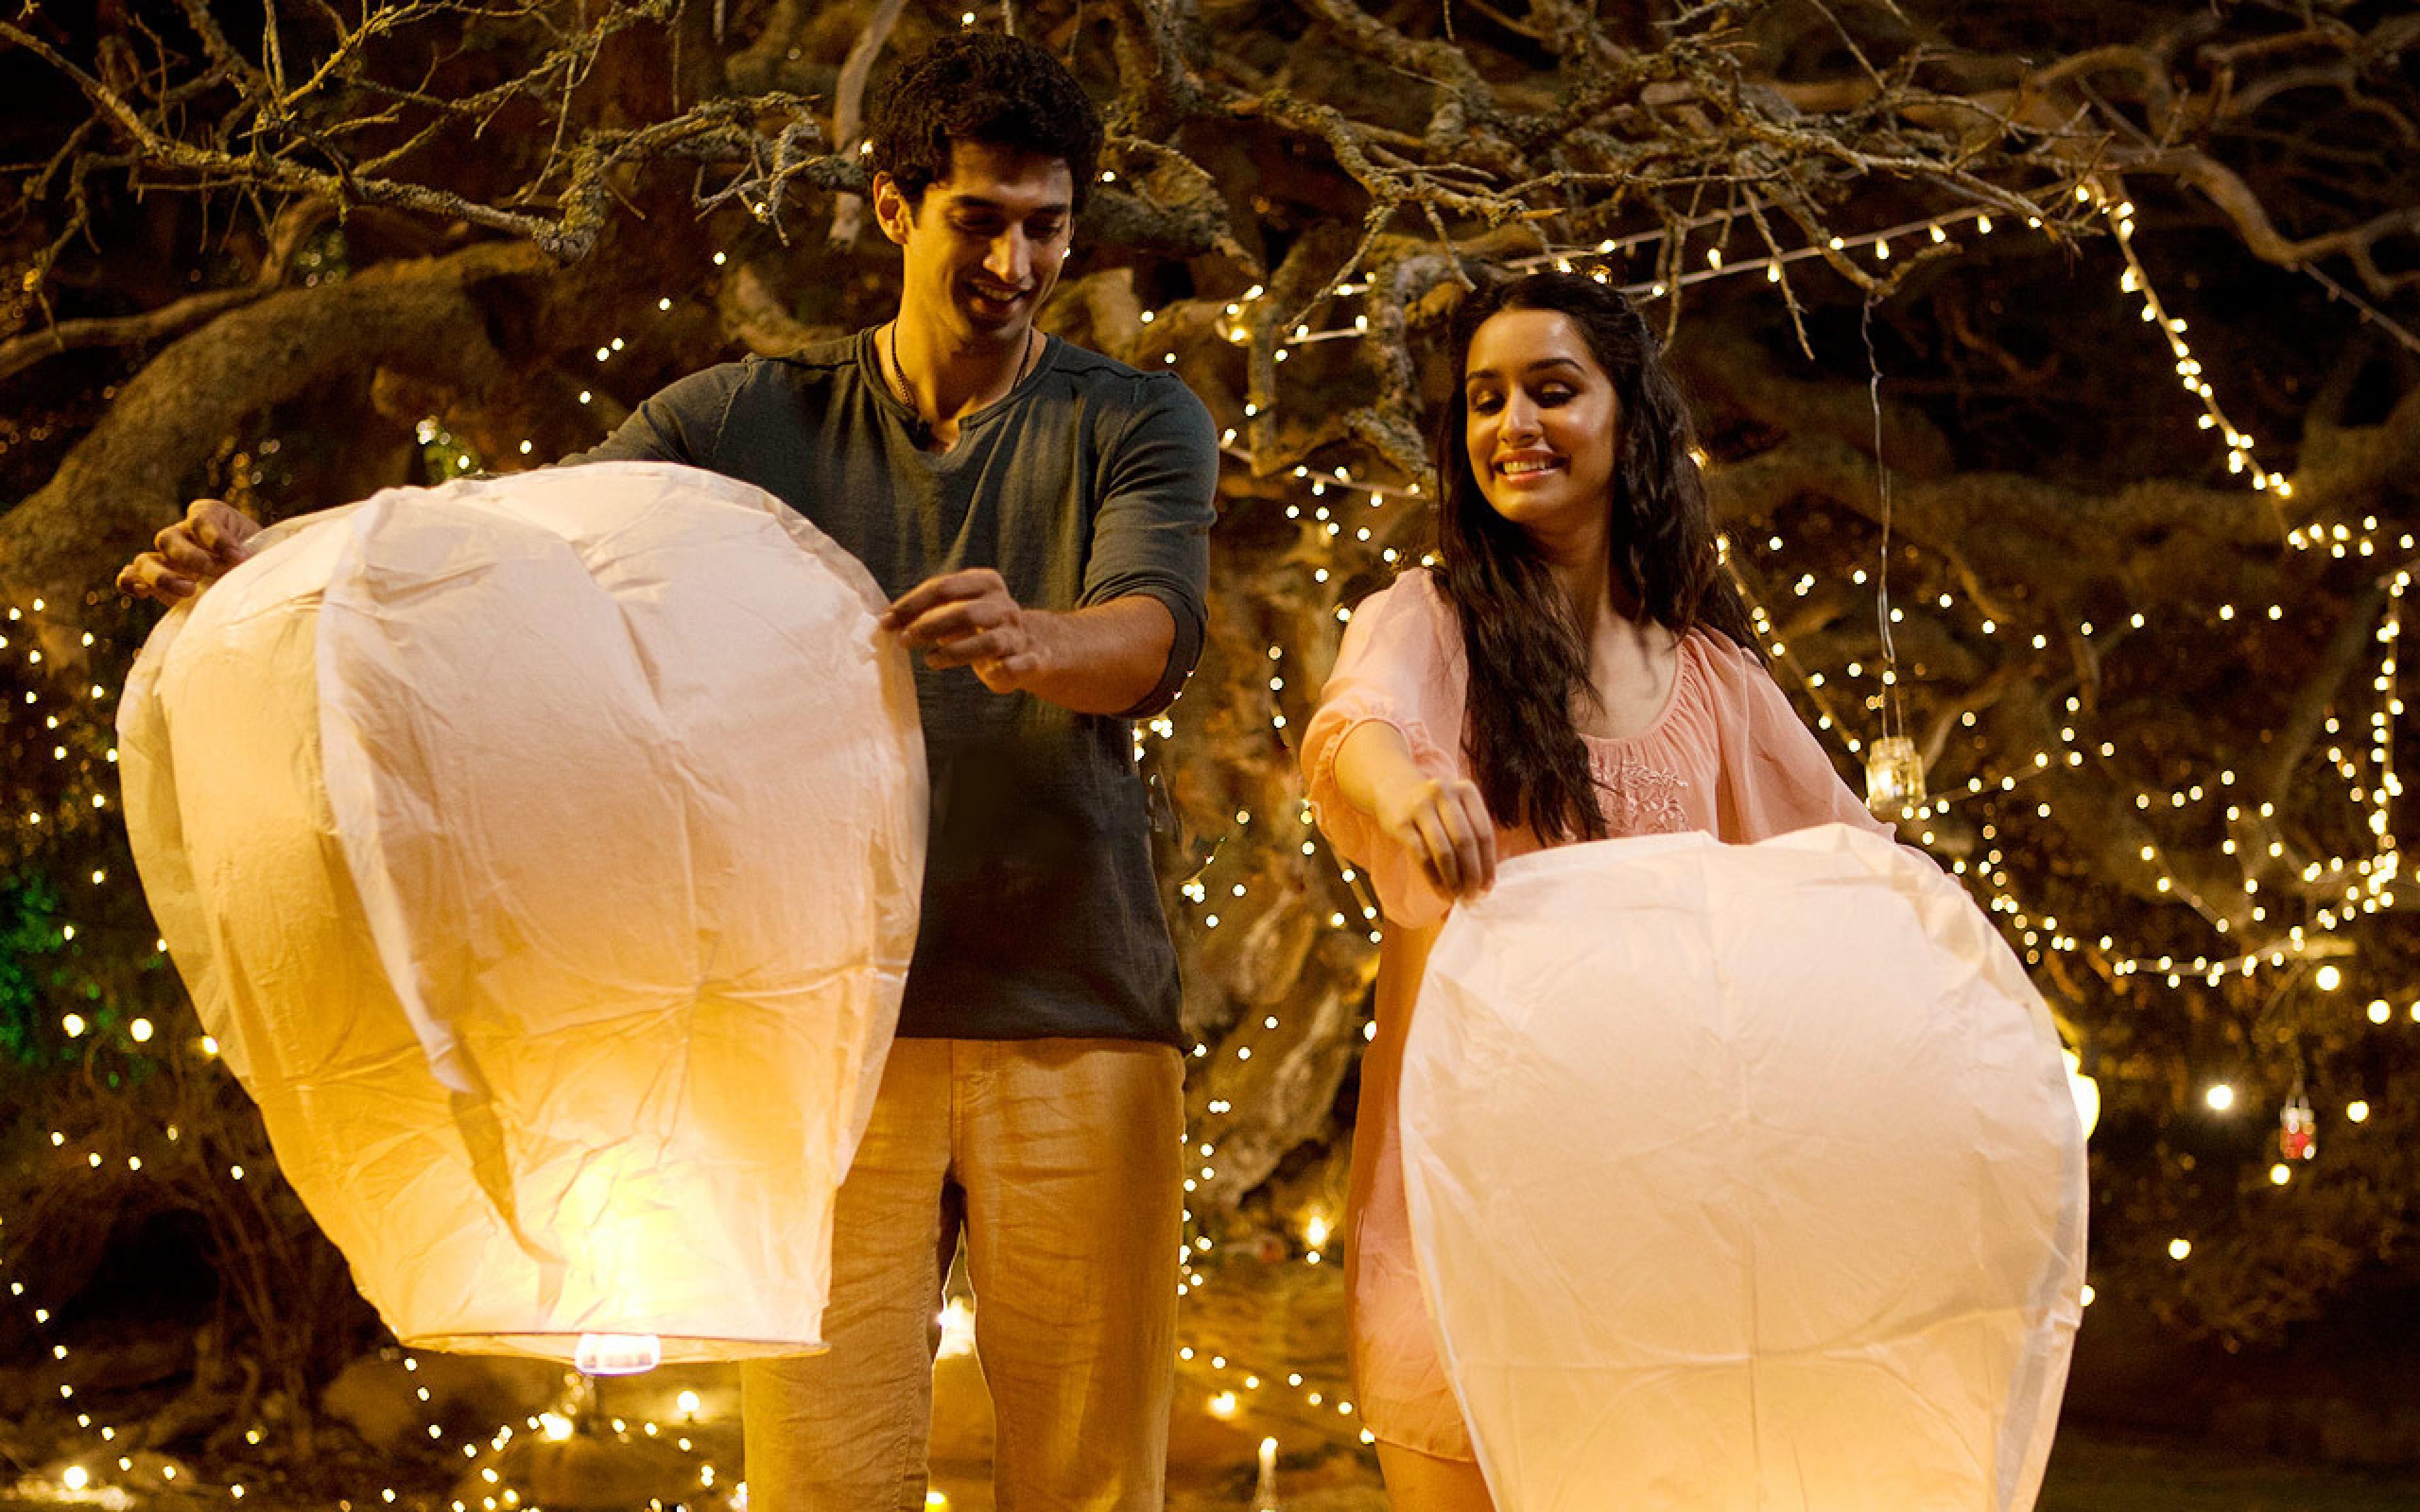 Download Shraddha Kapoor In Aashiqui 2 Movie Hd Wallpaper: Shraddha Kapoor In Aashiqui 2, HD Wallpaper